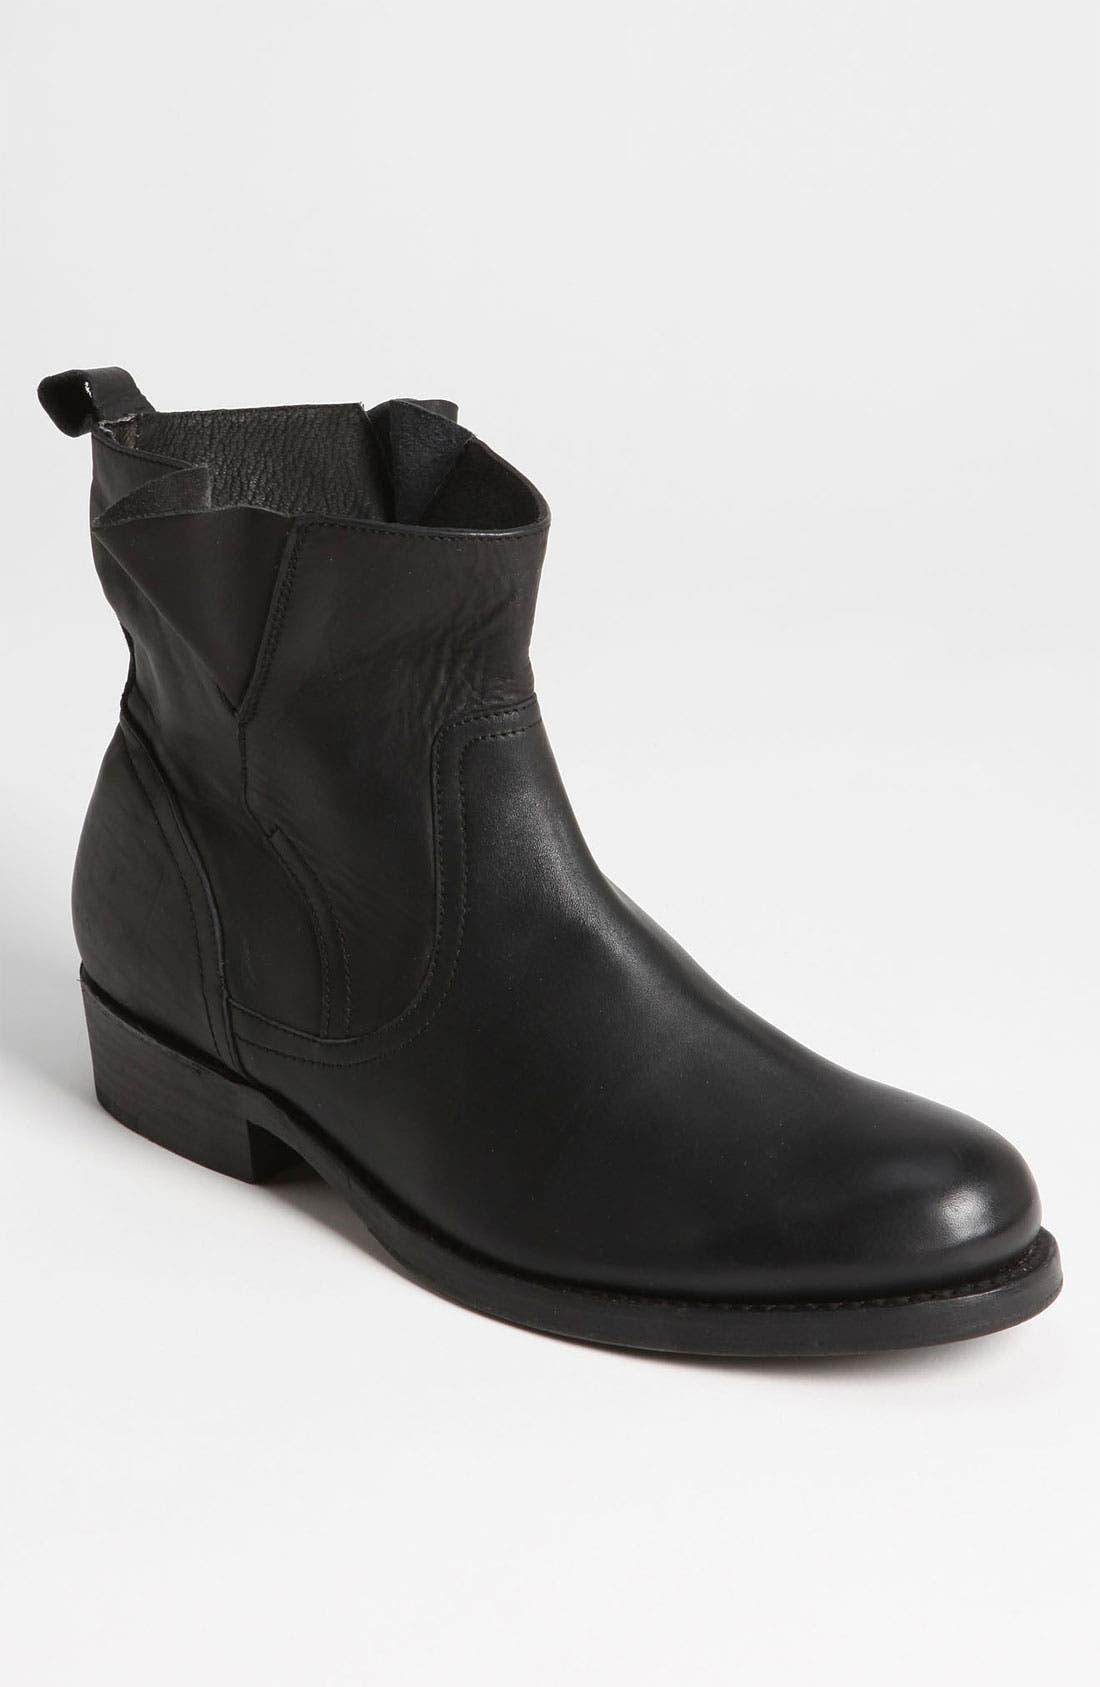 Alternate Image 1 Selected - J.D. Fisk 'Oslo' Boot